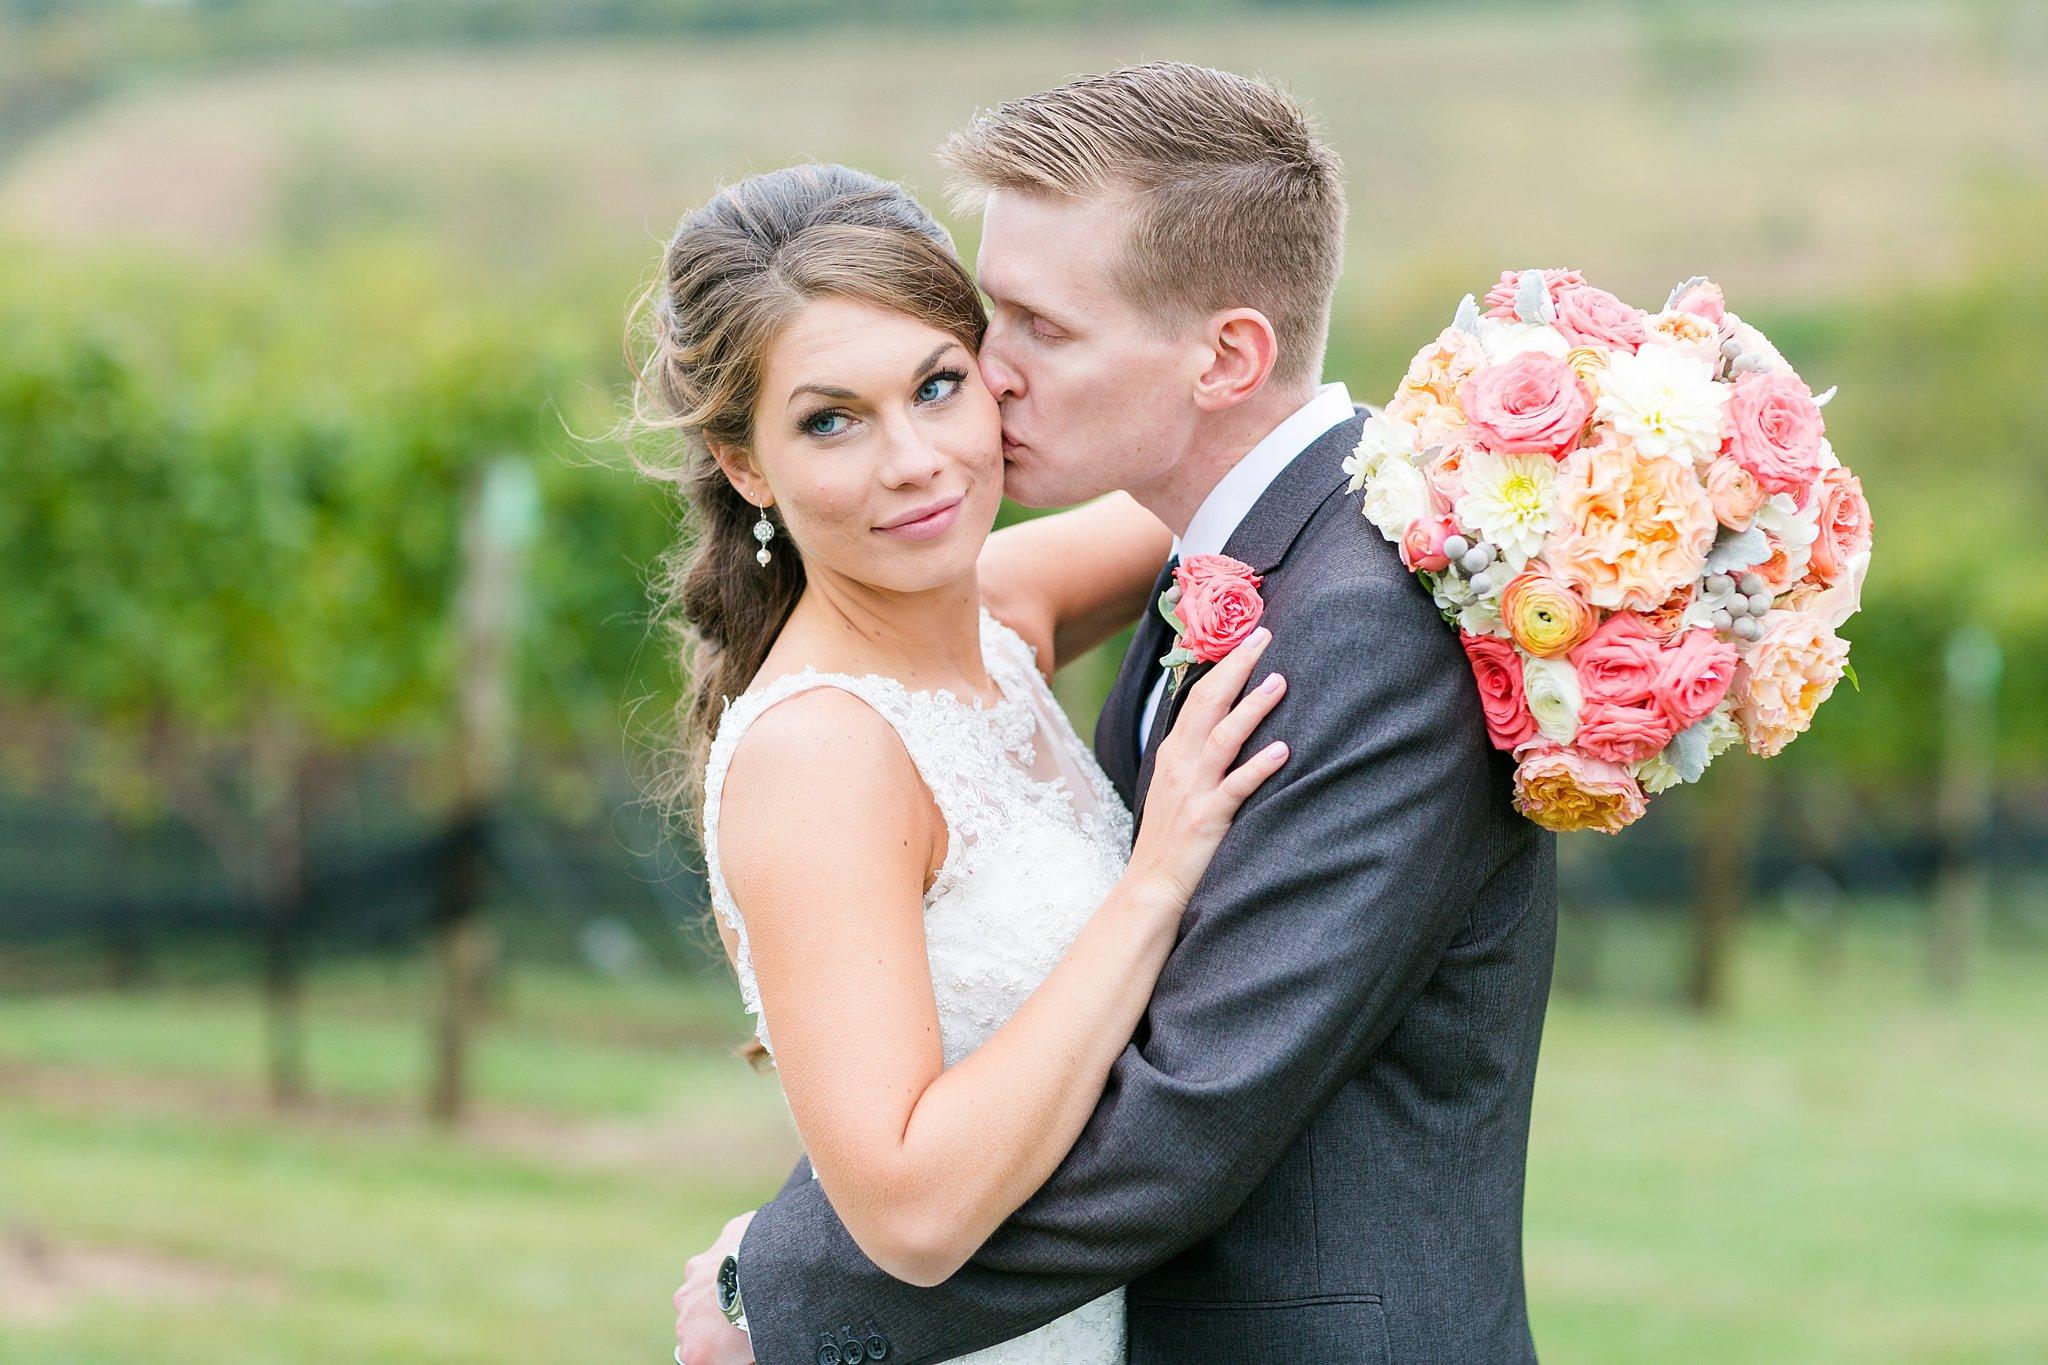 Stone Tower Winery Wedding Photos Virginia Wedding Photographer Megan Kelsey Photography Sam & Angela-229.jpg